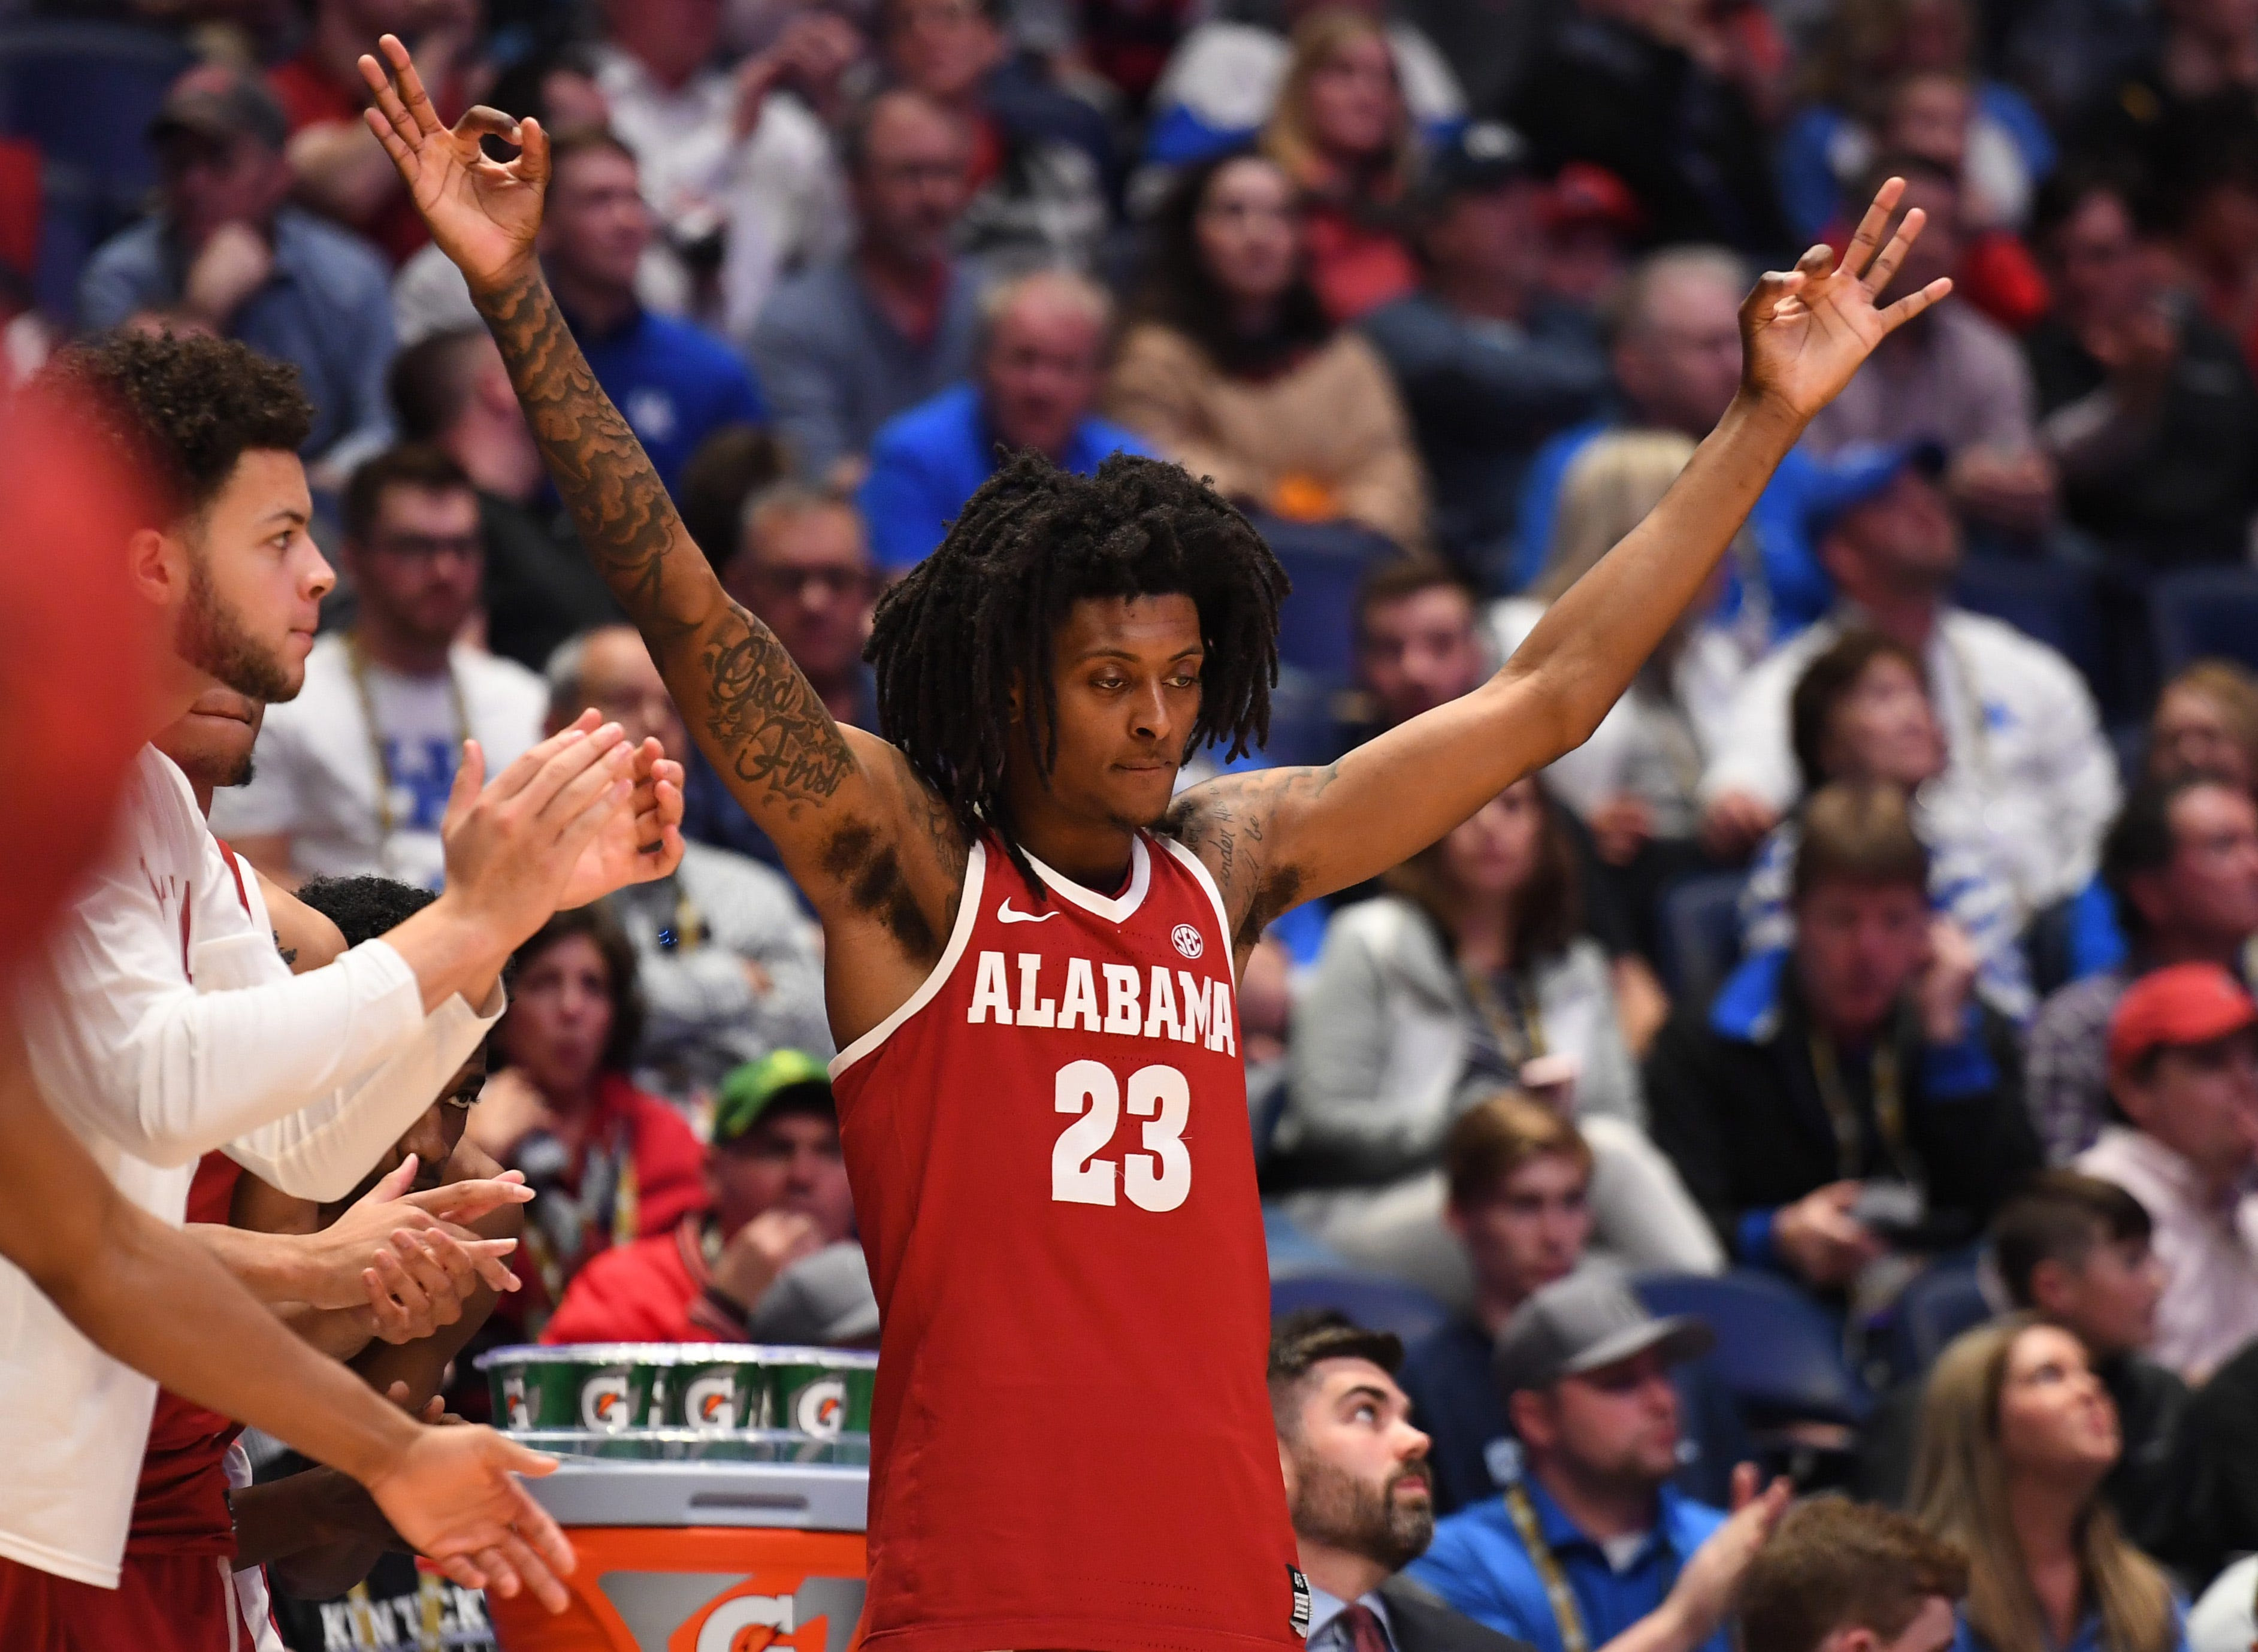 Alabama basketball's John Petty Jr. finds balance in basketball, parenthood